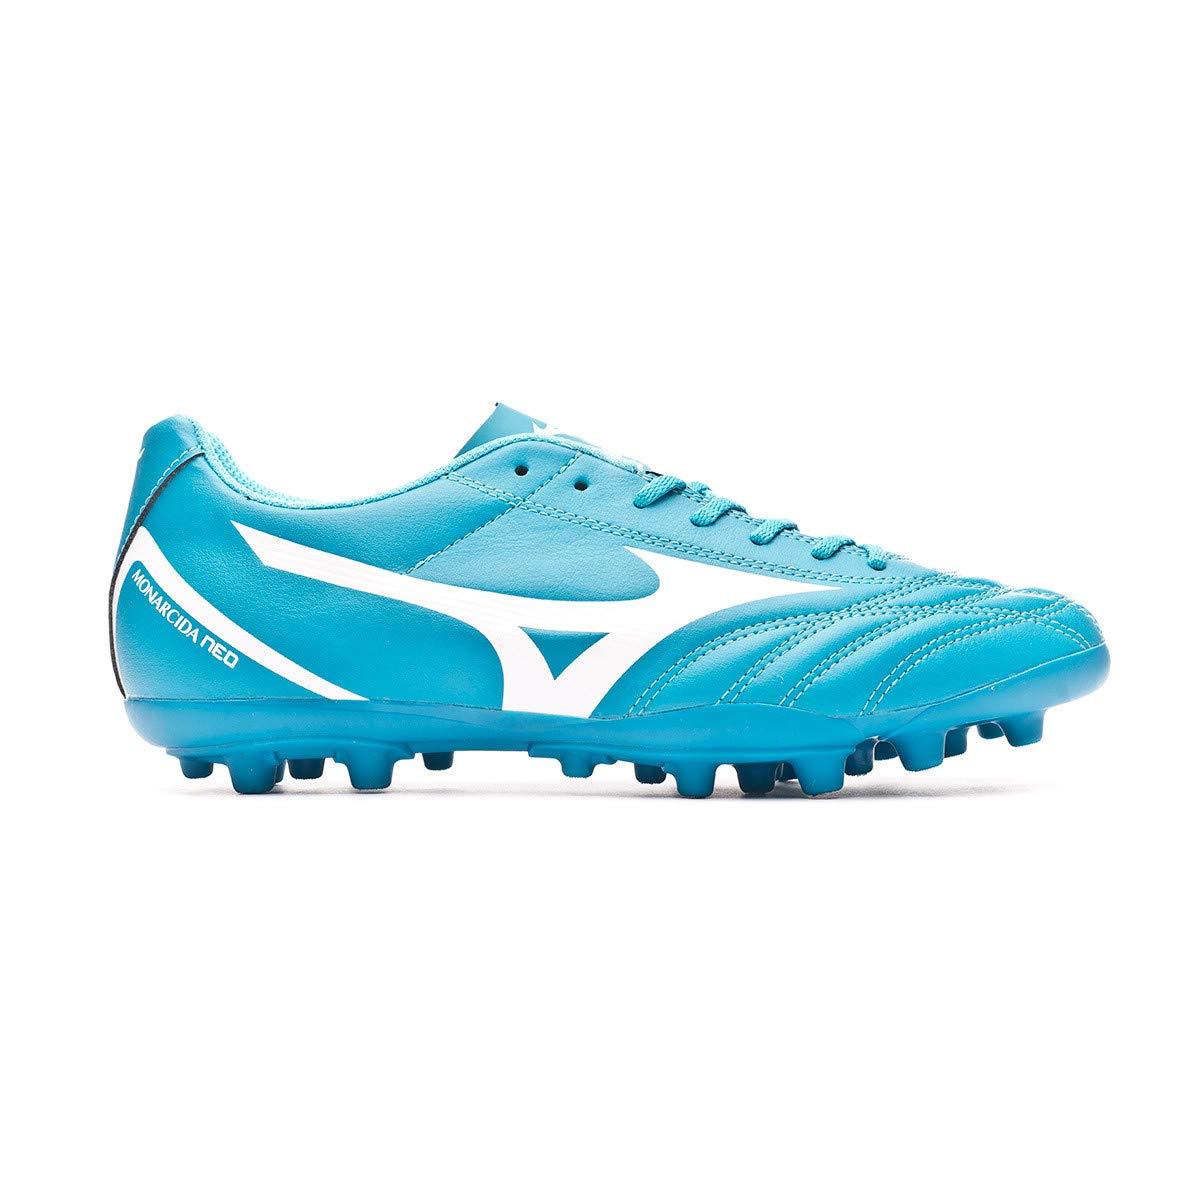 Mizuno Monarcida Neo Select AG, Scarpe da Calcio, Blue Atoll